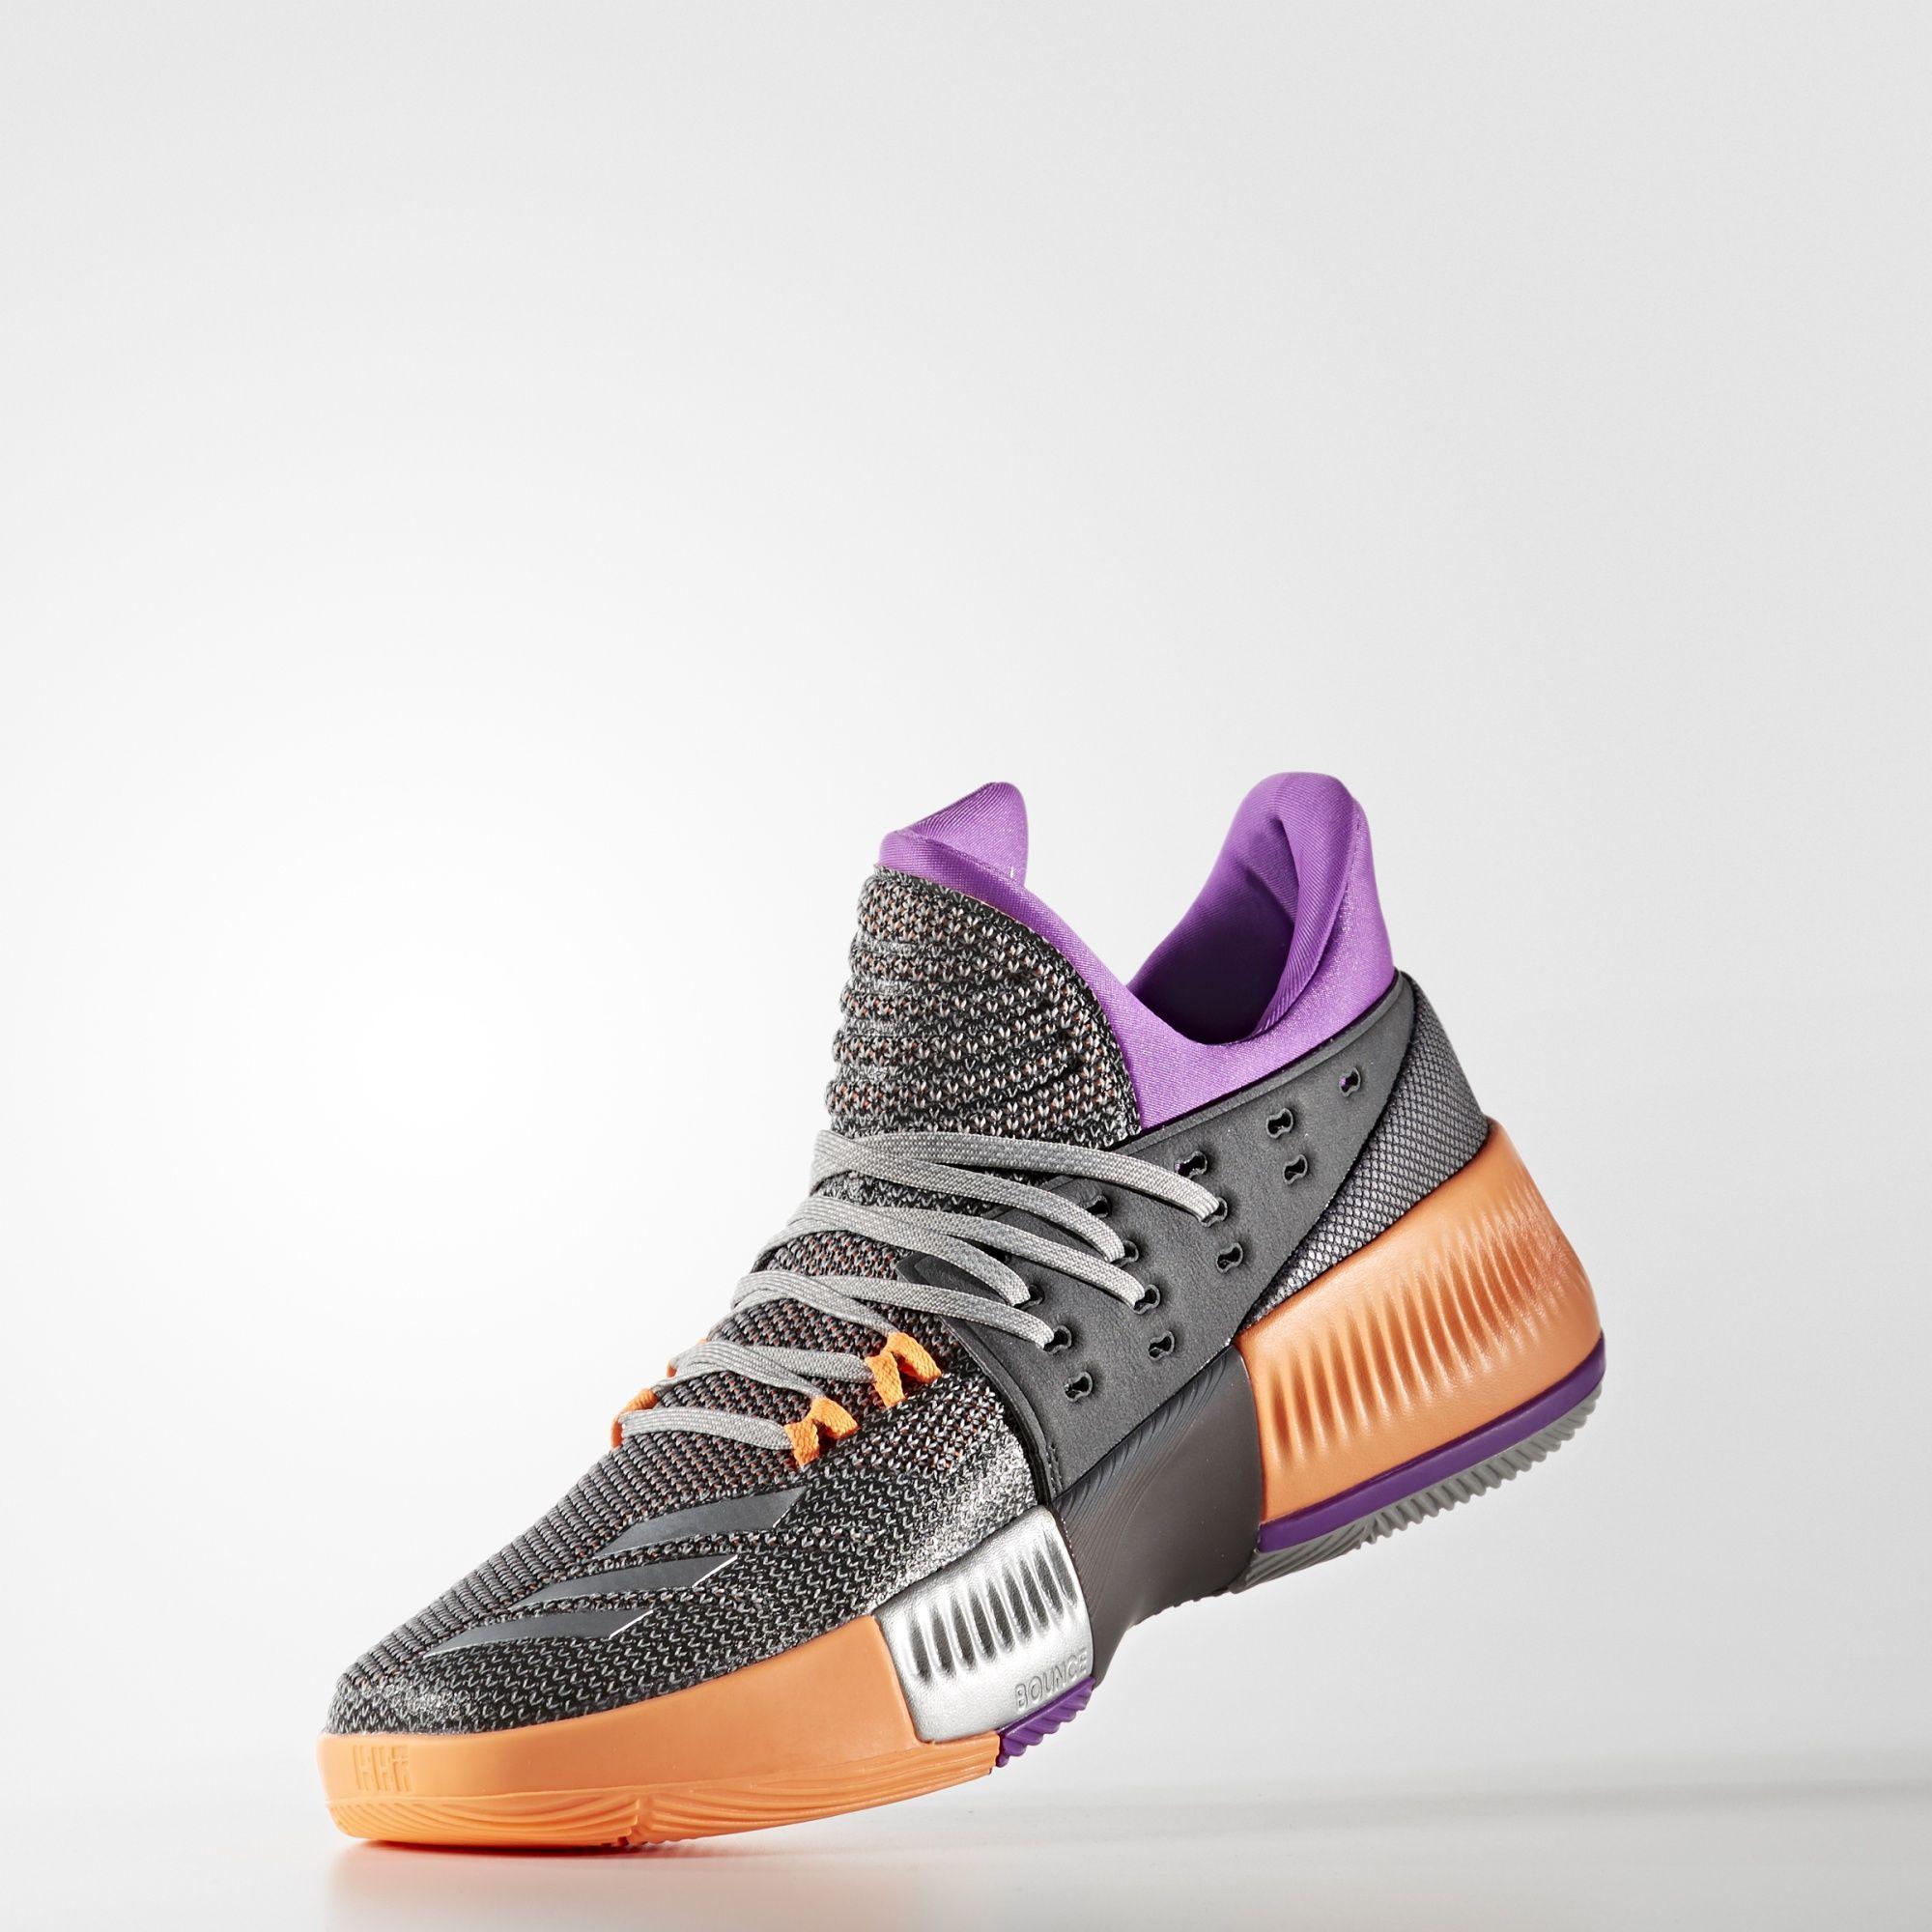 adidas Dame 3 'All Star' 2